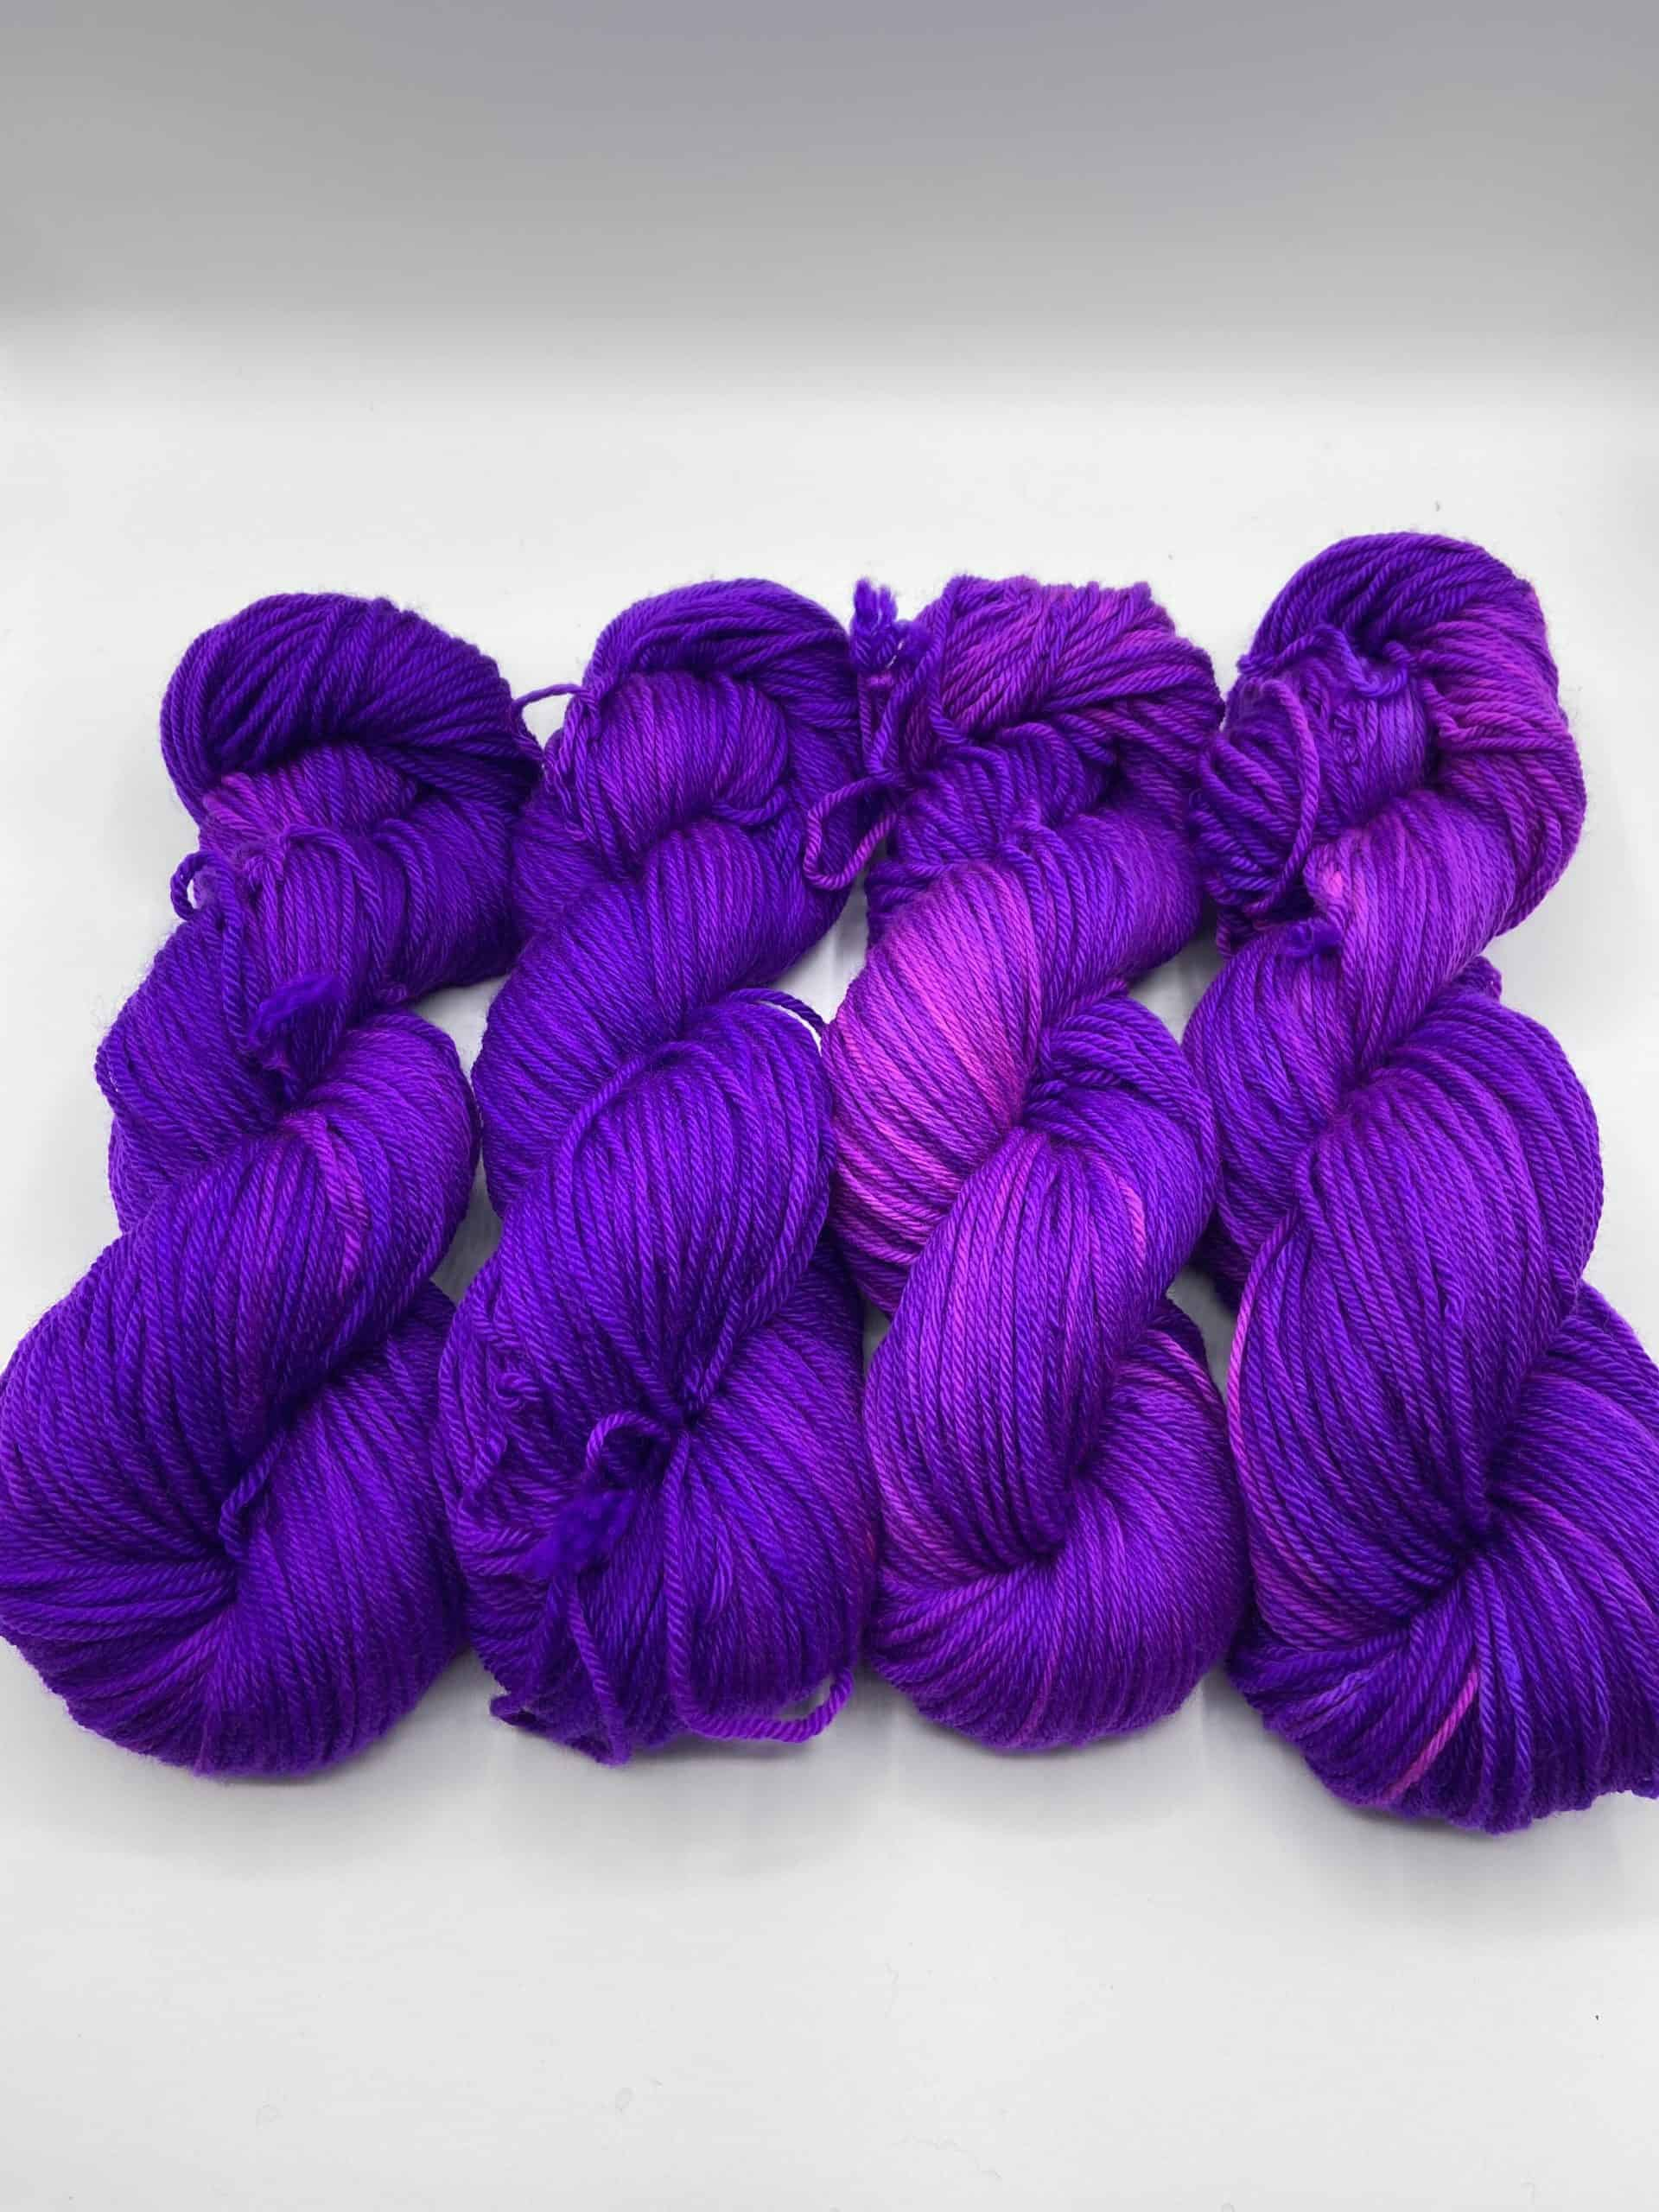 Bright purple yarn.